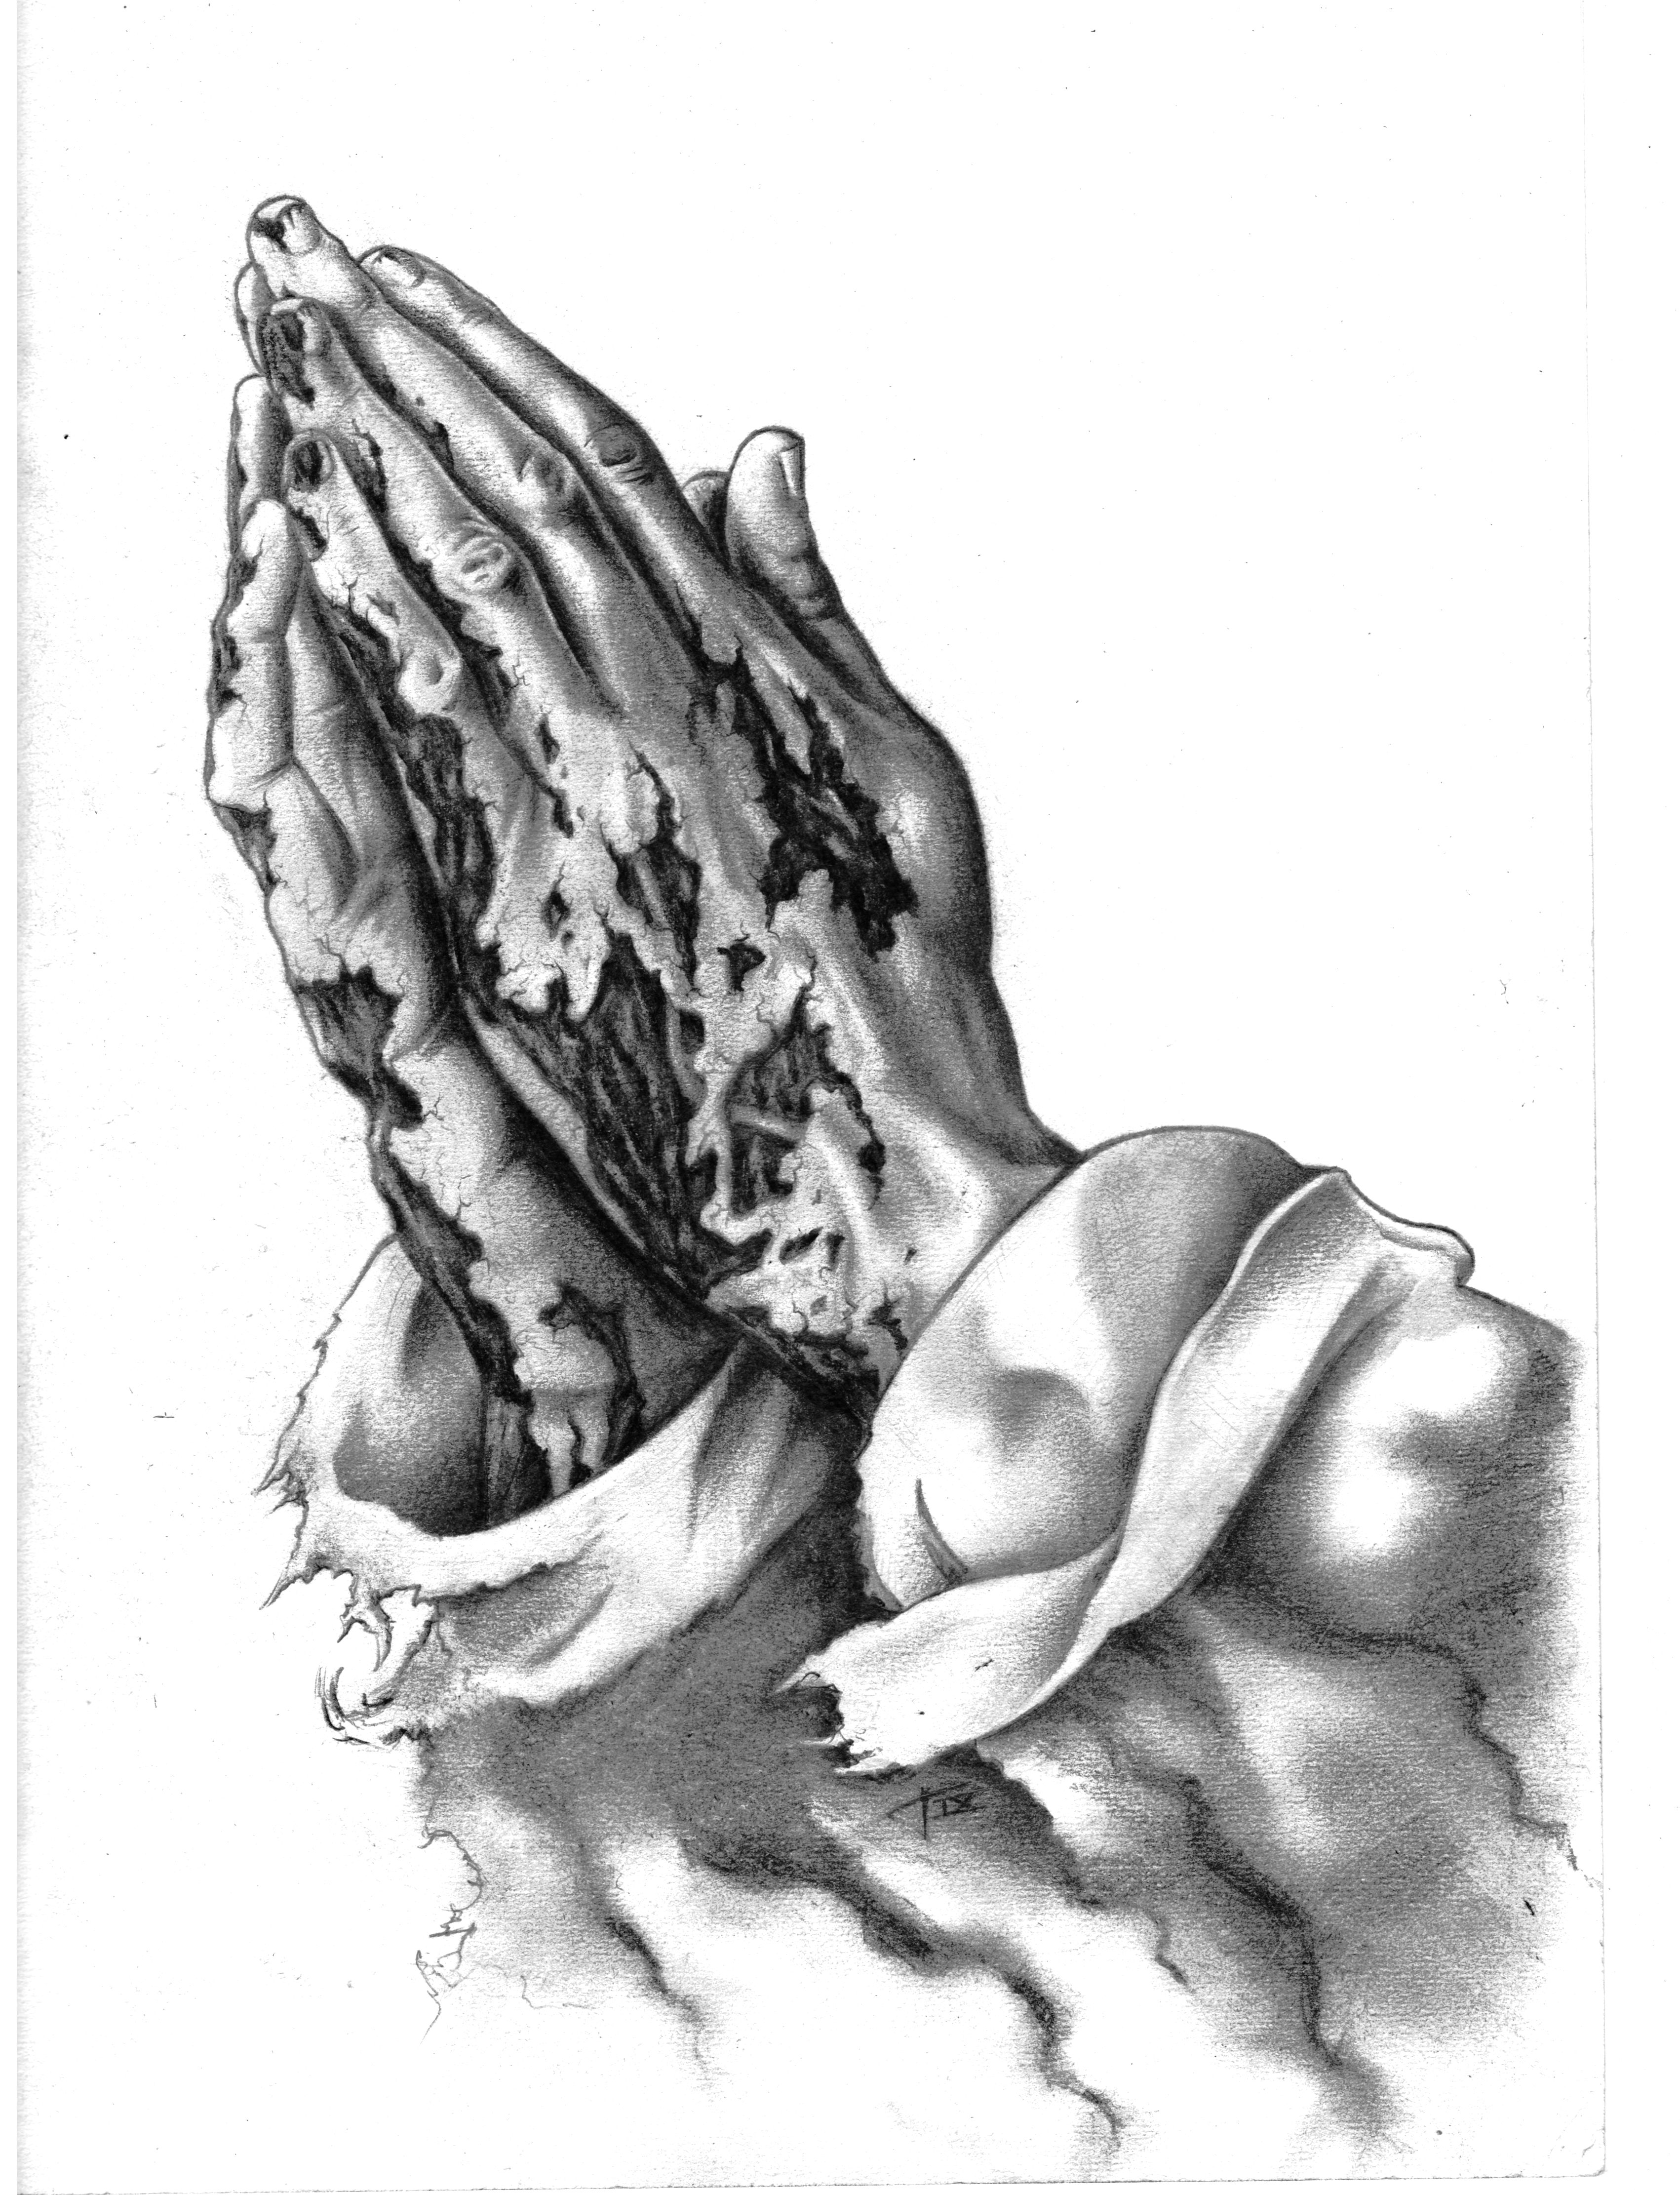 prayinghands explore prayinghands on deviantart